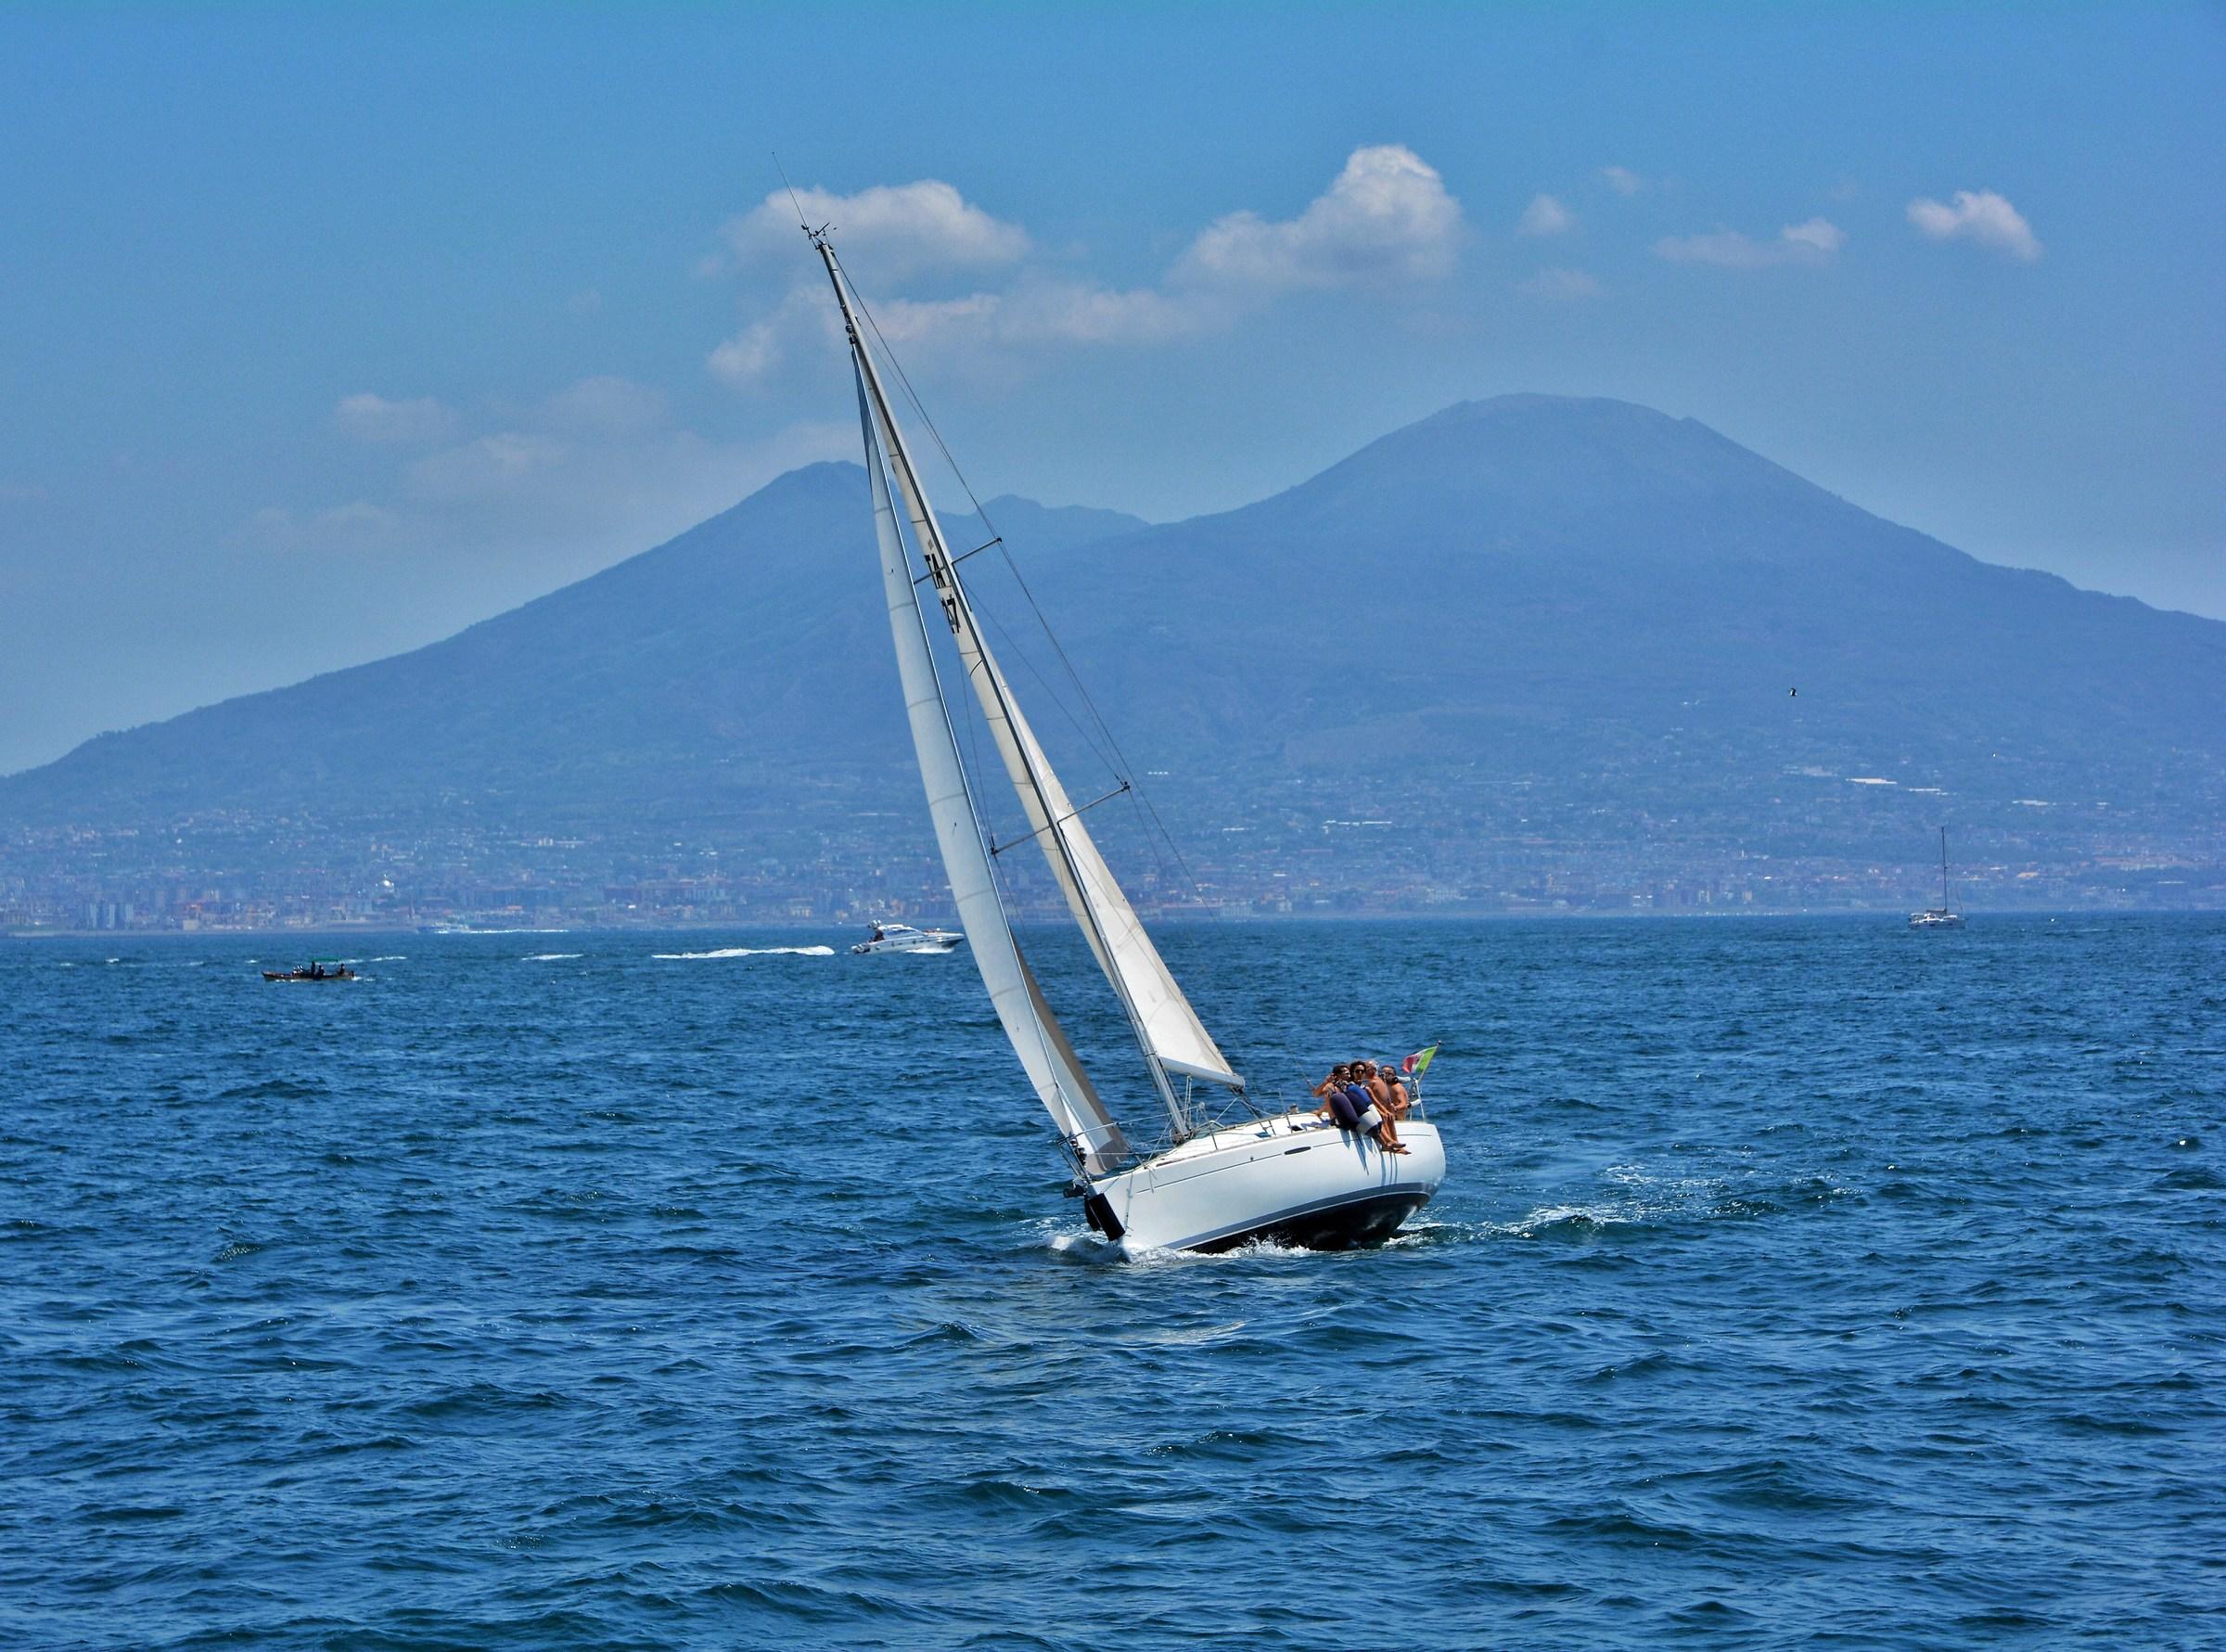 Sail at the foot of Mount Vesuvius...